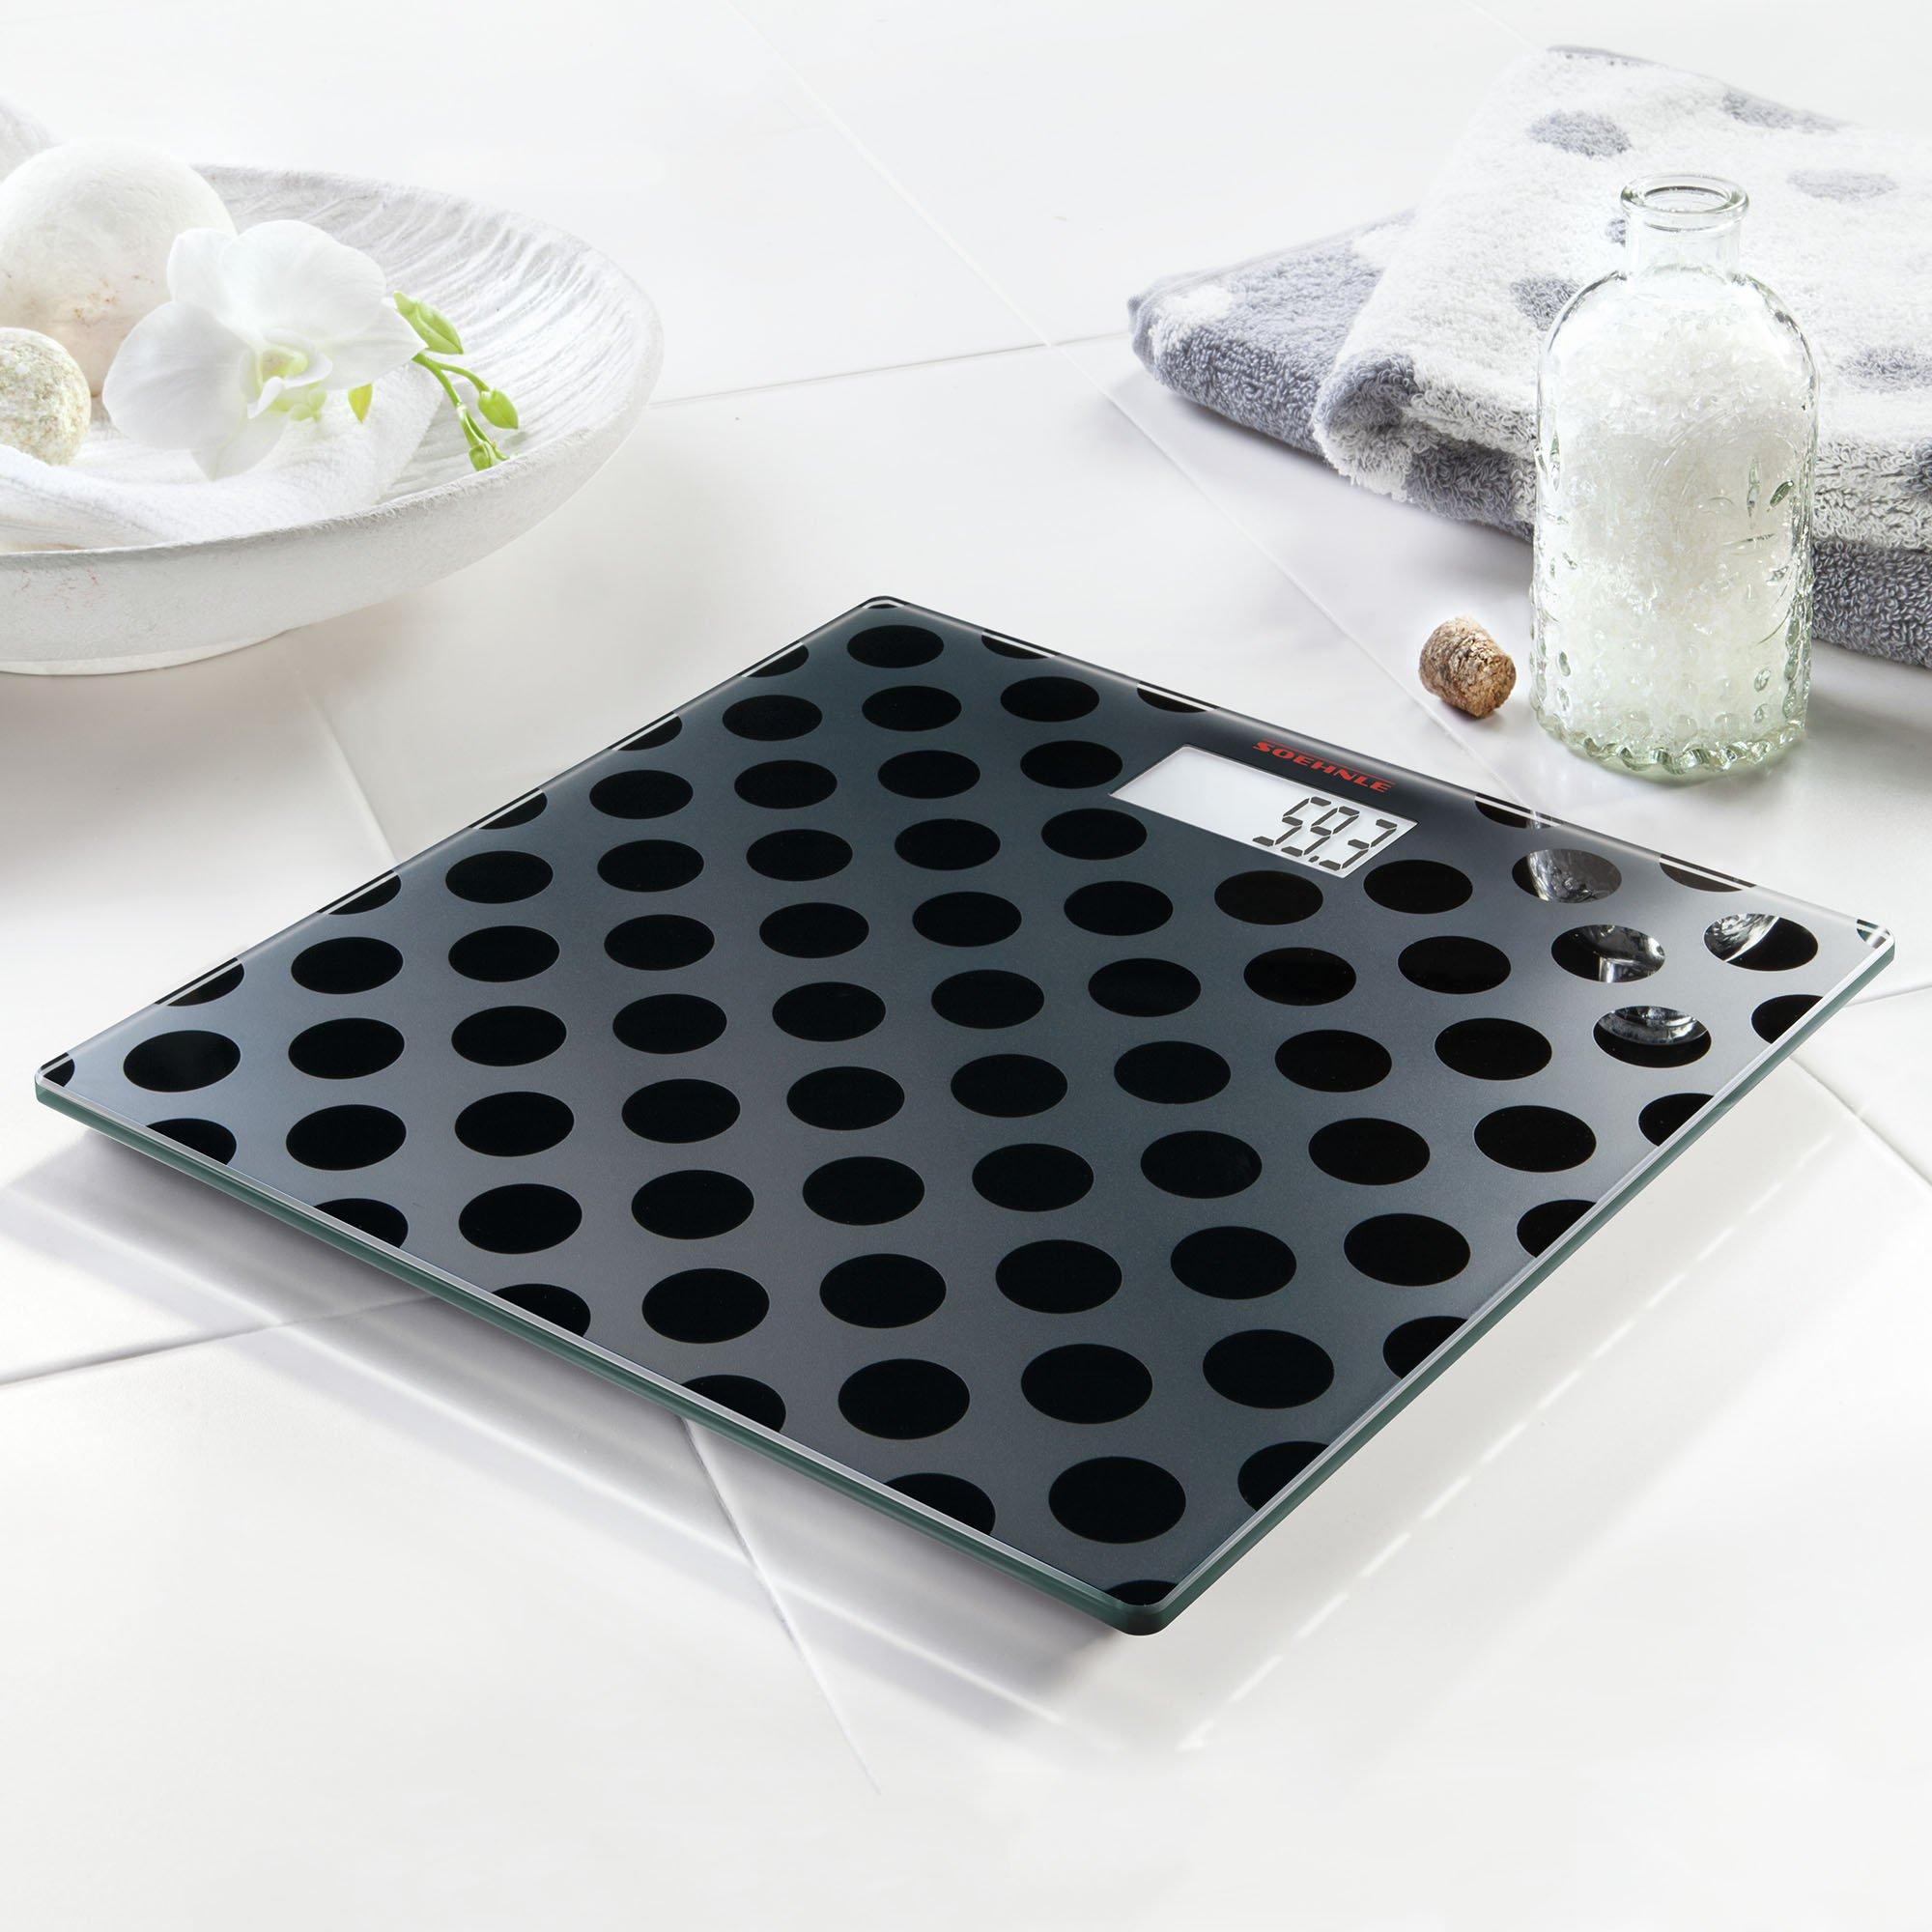 Soehnle Maya Digital black Edition Personal Glass Bathroom Scale, Circles by Soehnle (Image #3)